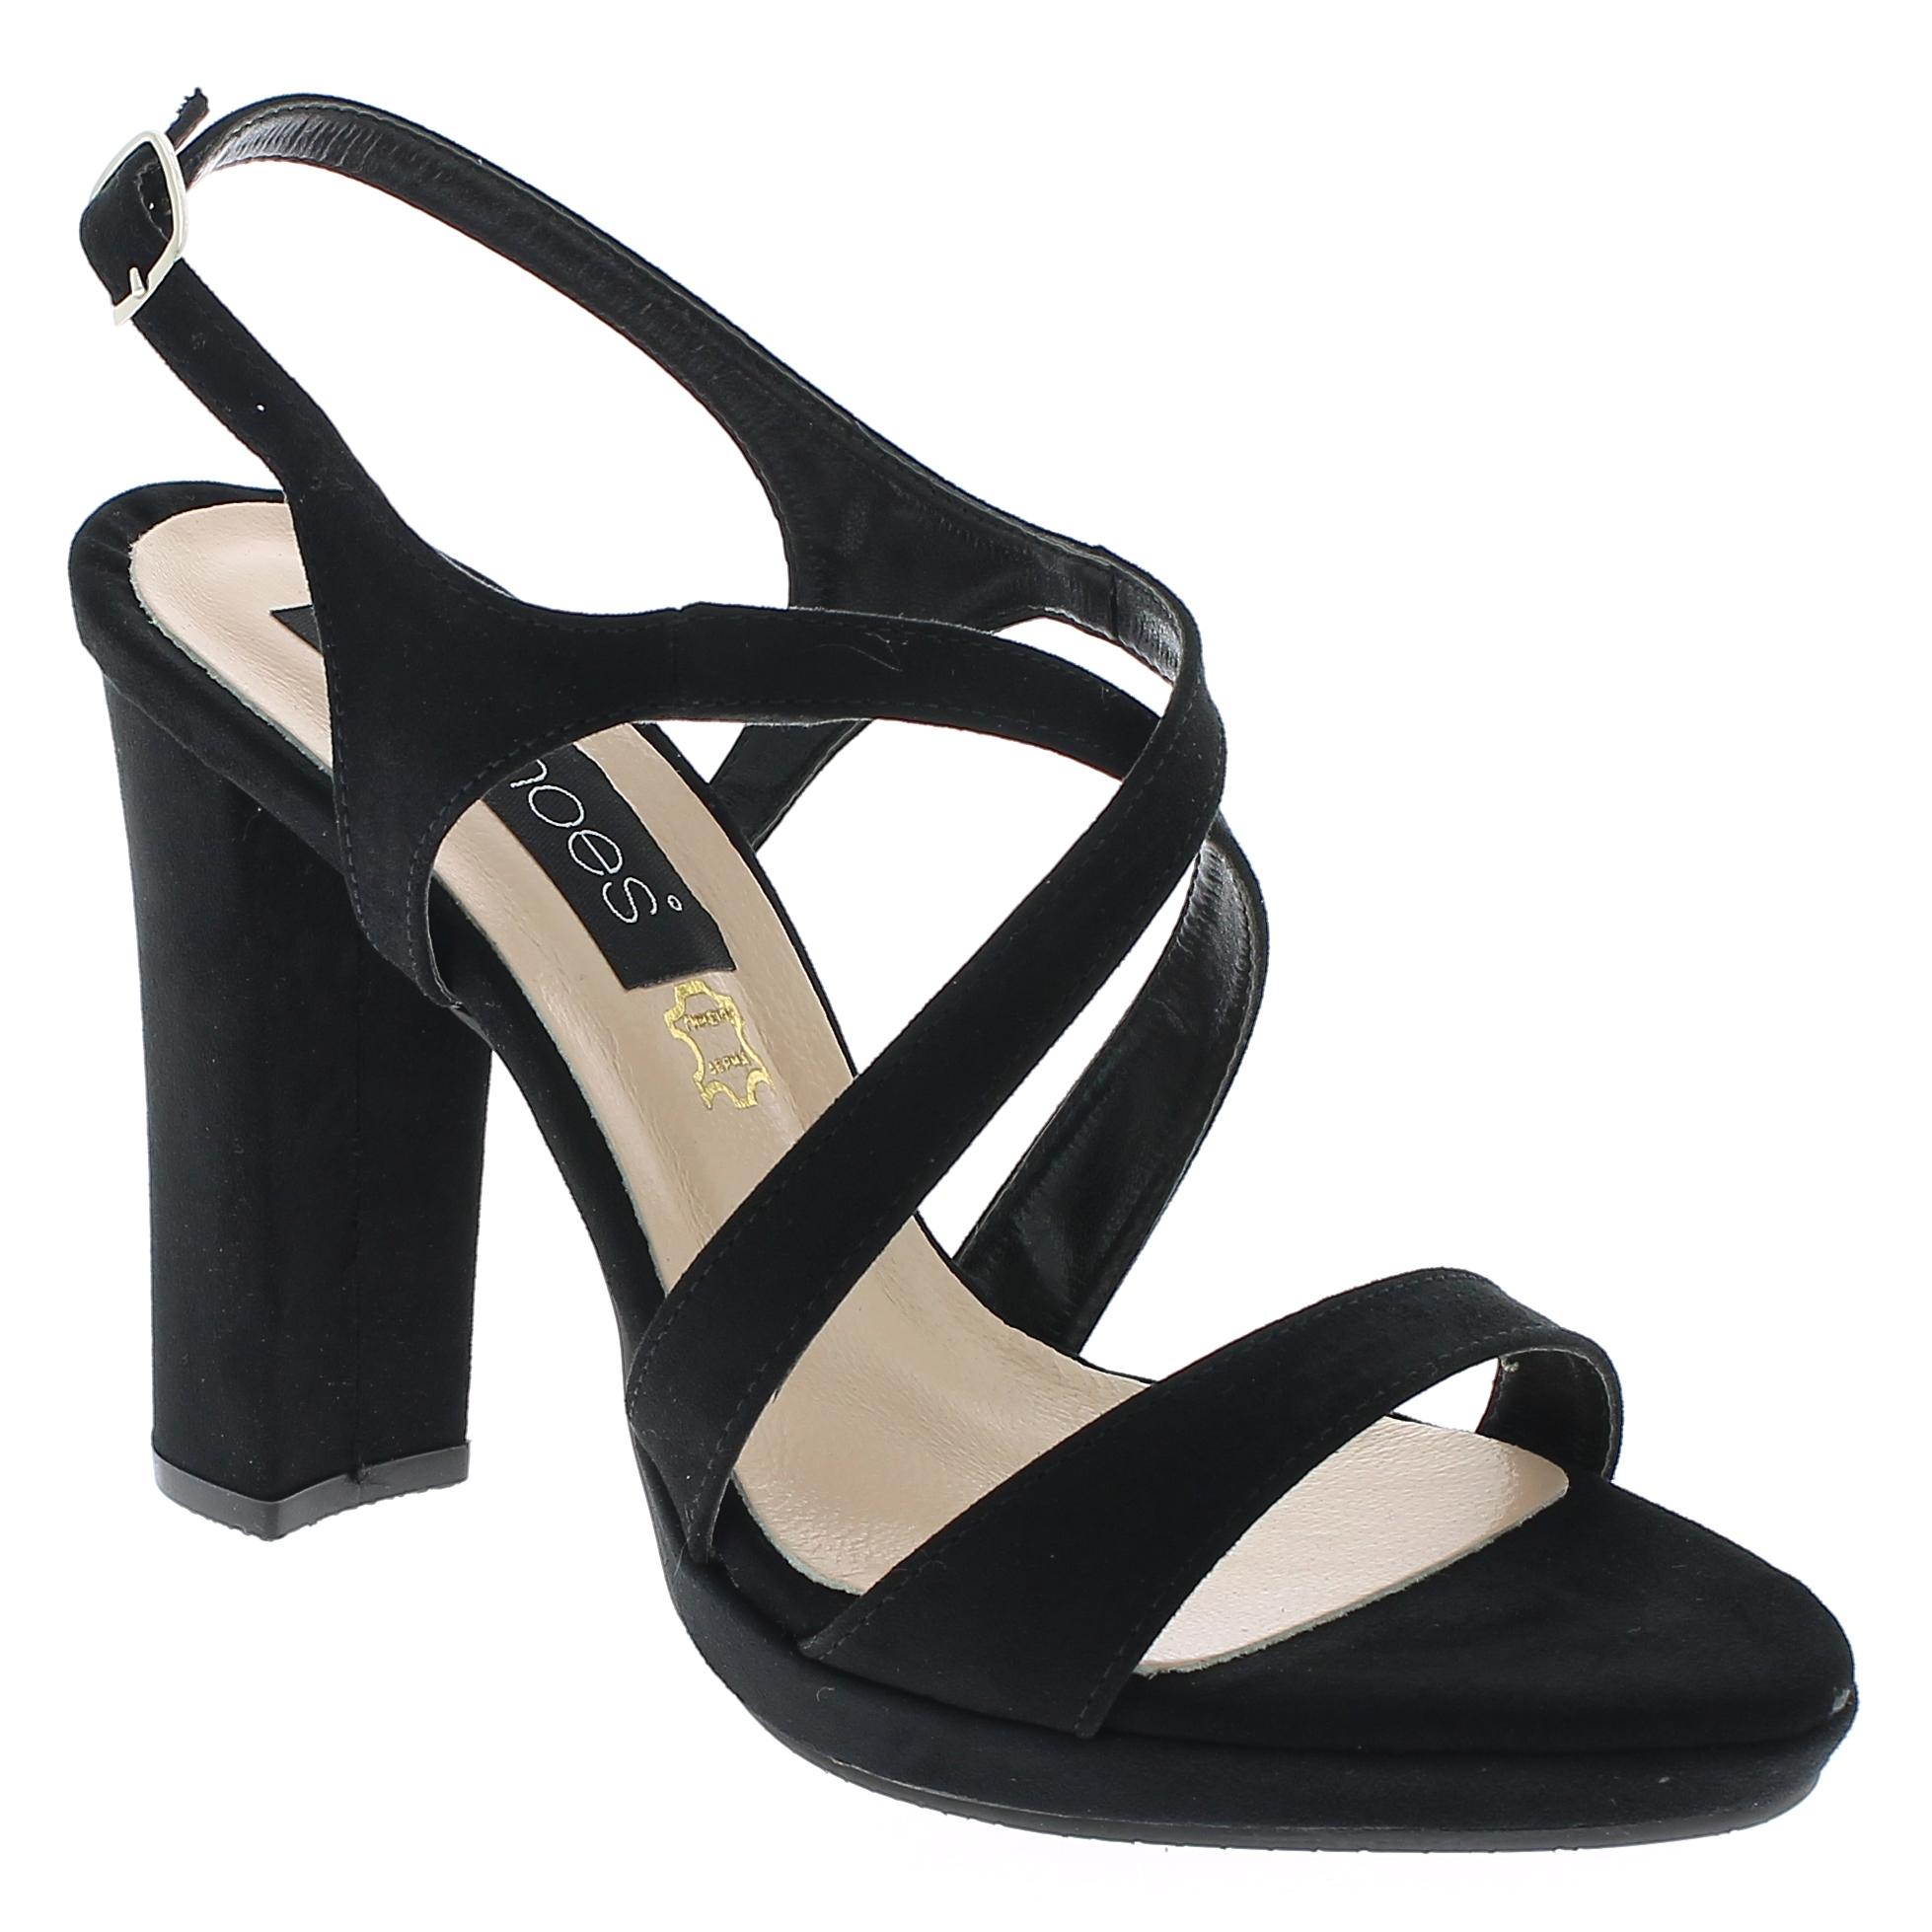 IQSHOES Γυναικείο Πέδιλο 1032 Μαύρο - IqShoes - 41.1032 BLACK -black-37/1/15/27 παπούτσια  πέδιλα